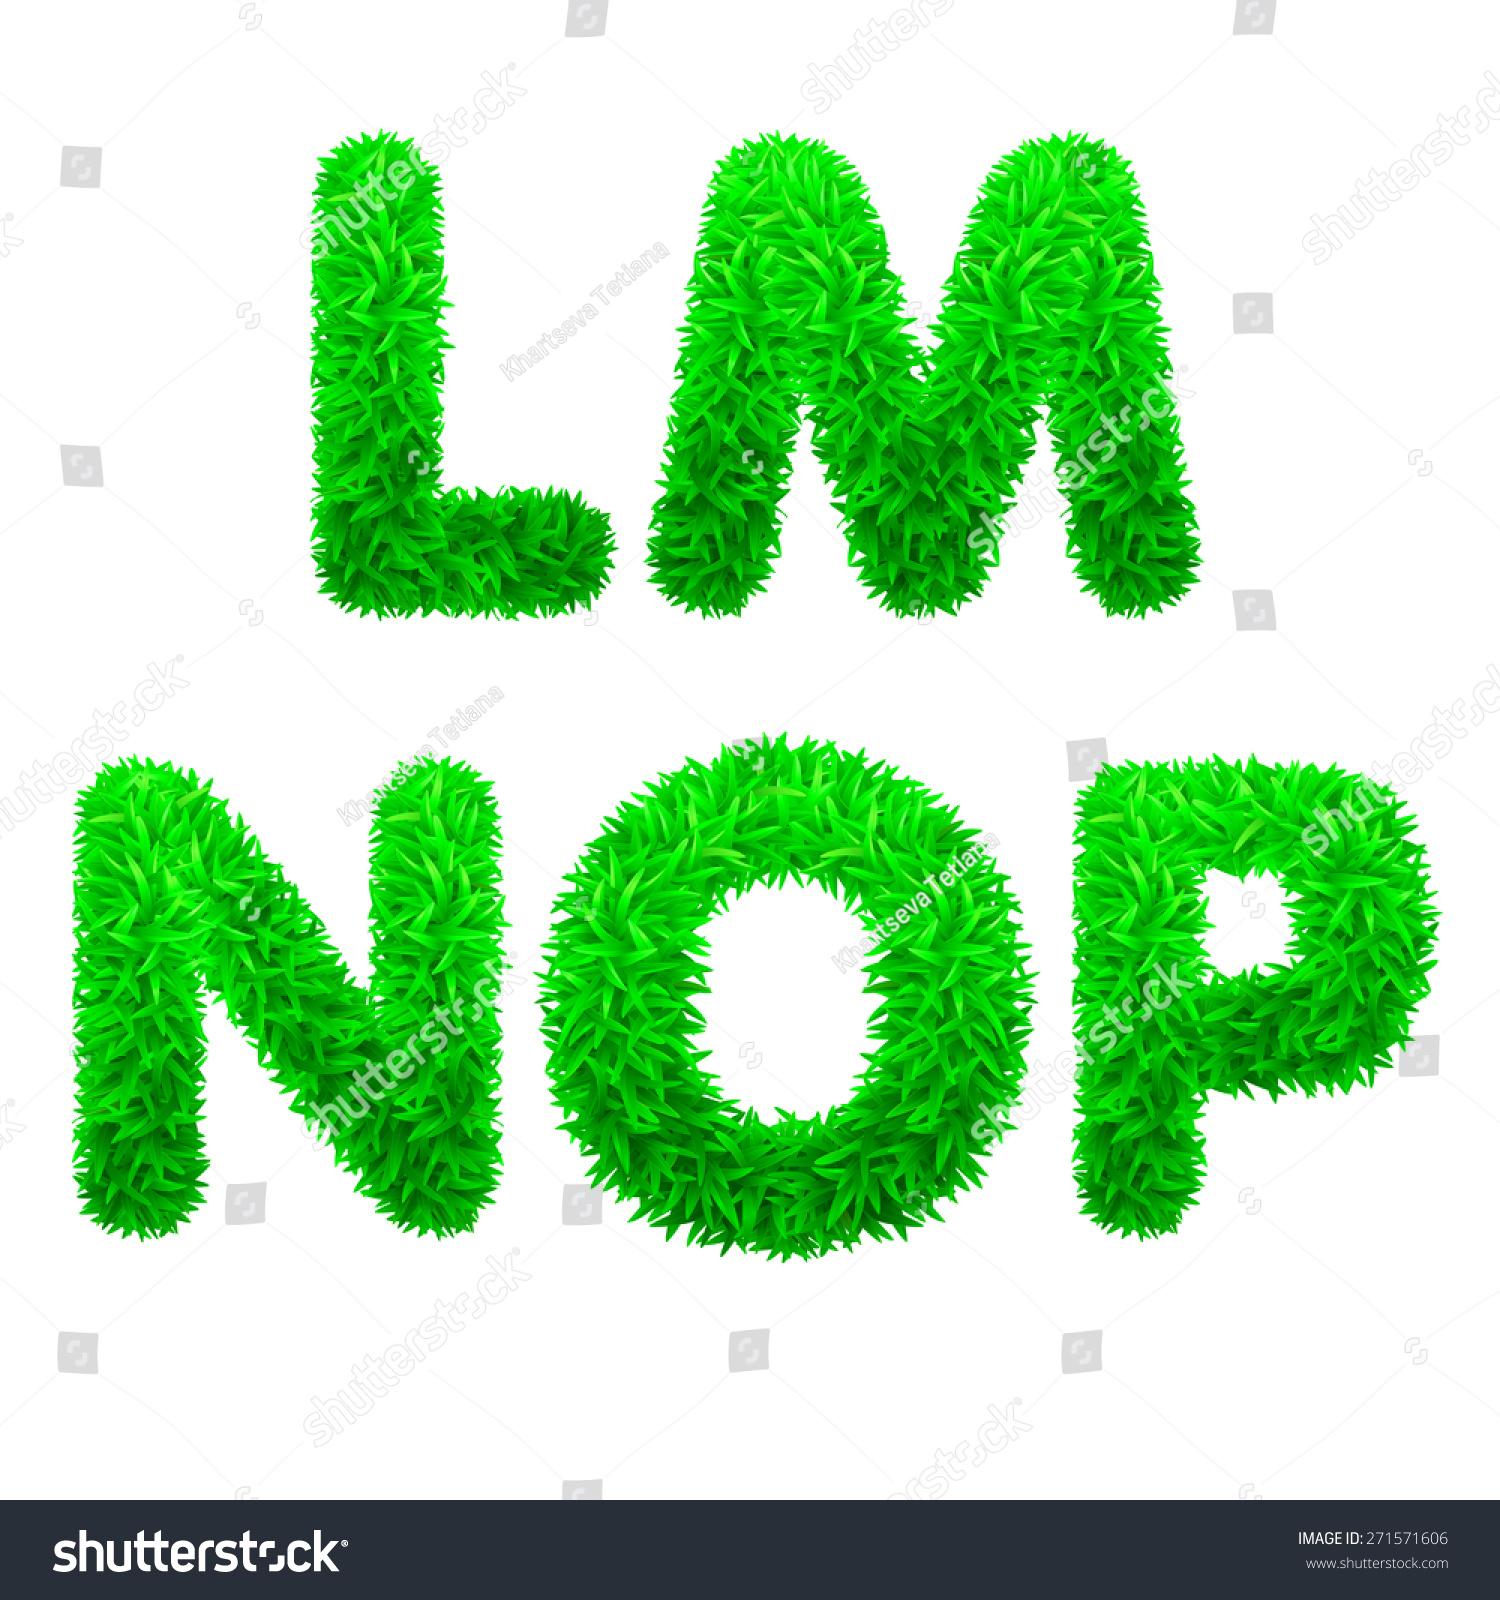 Font Letters Green Grass Vector Eps Stock Vector 271571606 Shutterstock